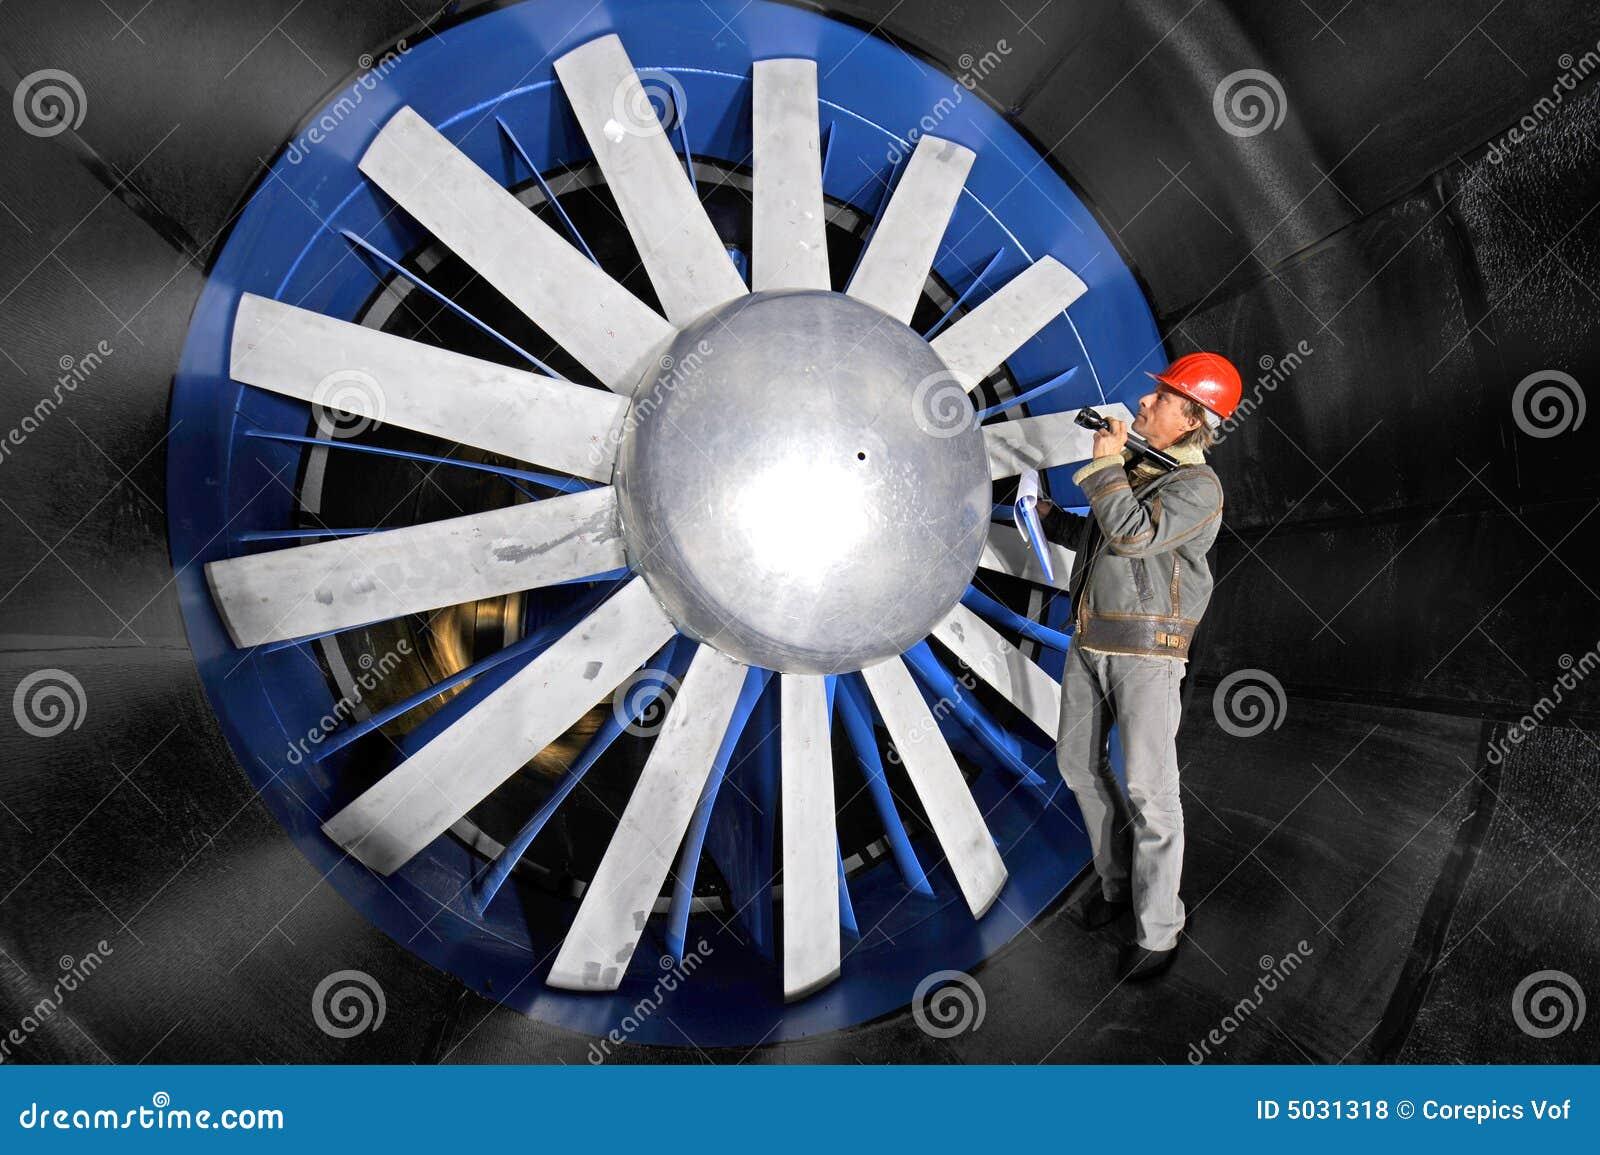 Inspecionando um windtunnel